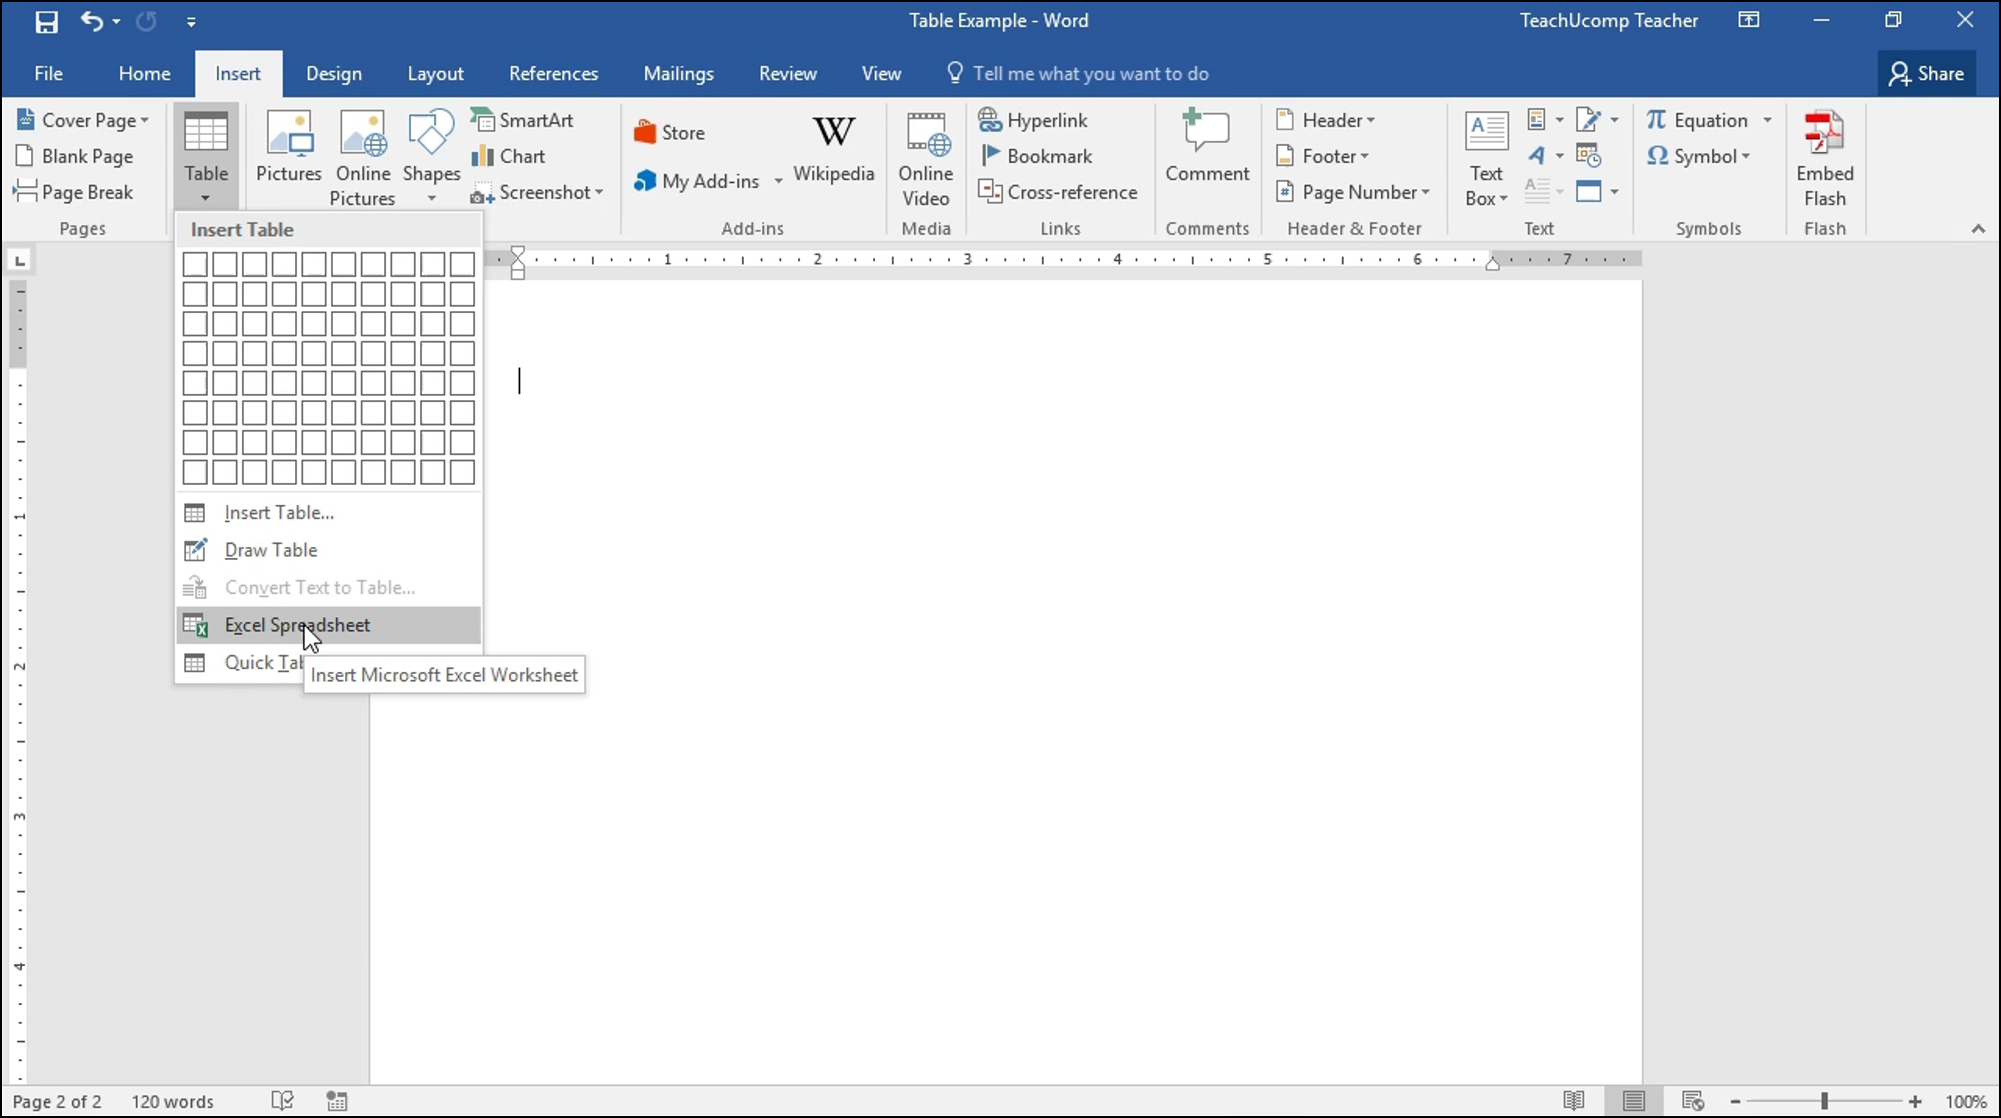 Excel Spreadsheet In Word For Insert An Excel Worksheet